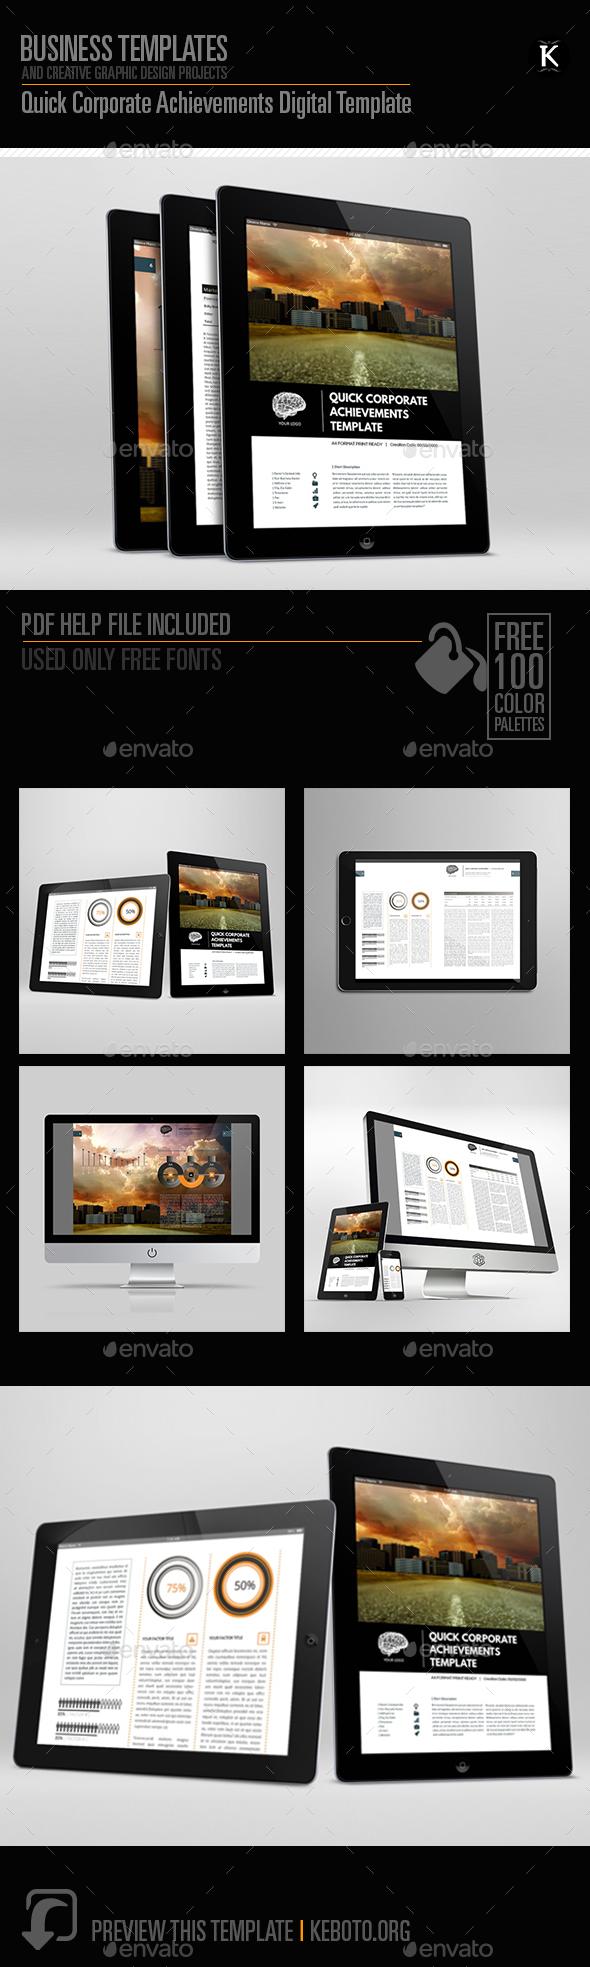 Quick Corporate Achievements Digital Template - ePublishing